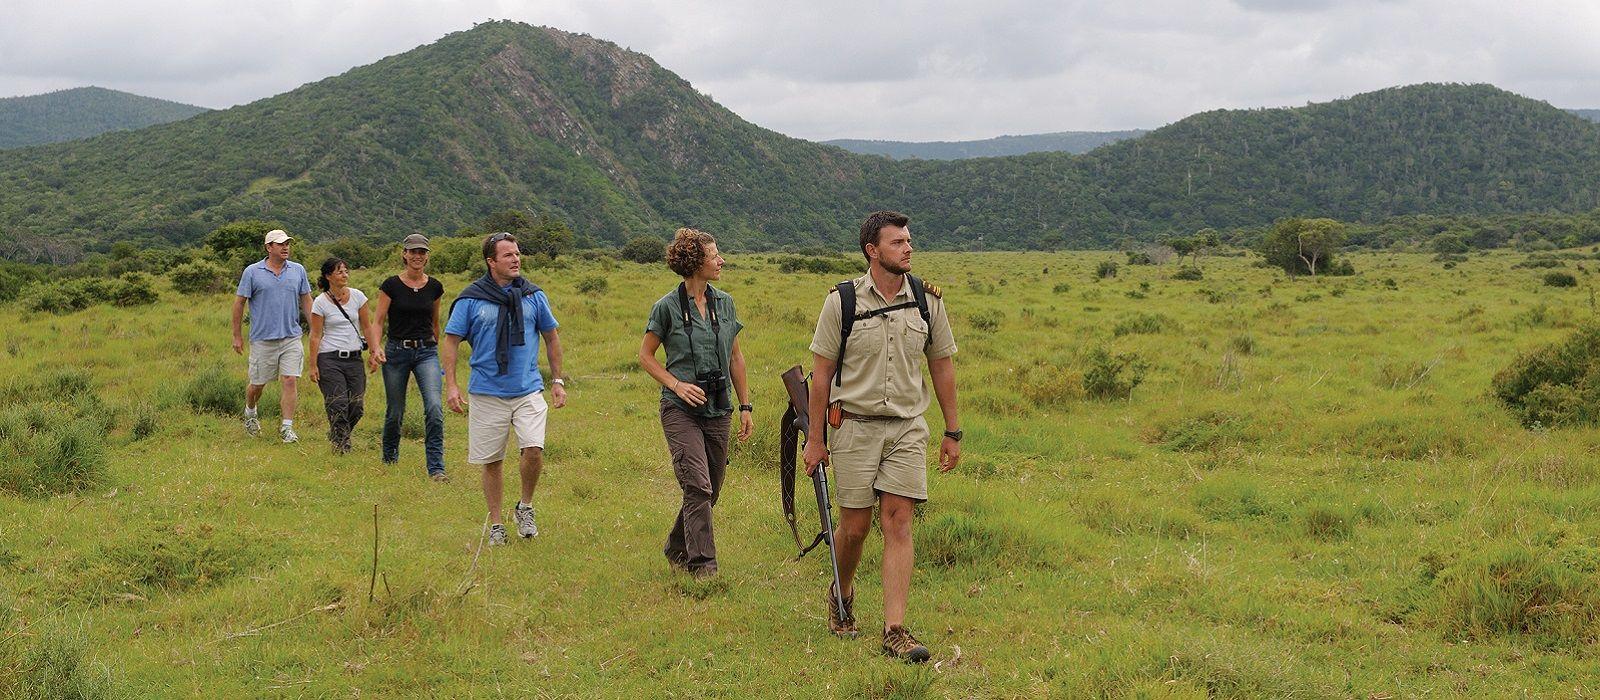 Destination Eastern Wild Coast – Hiking South Africa